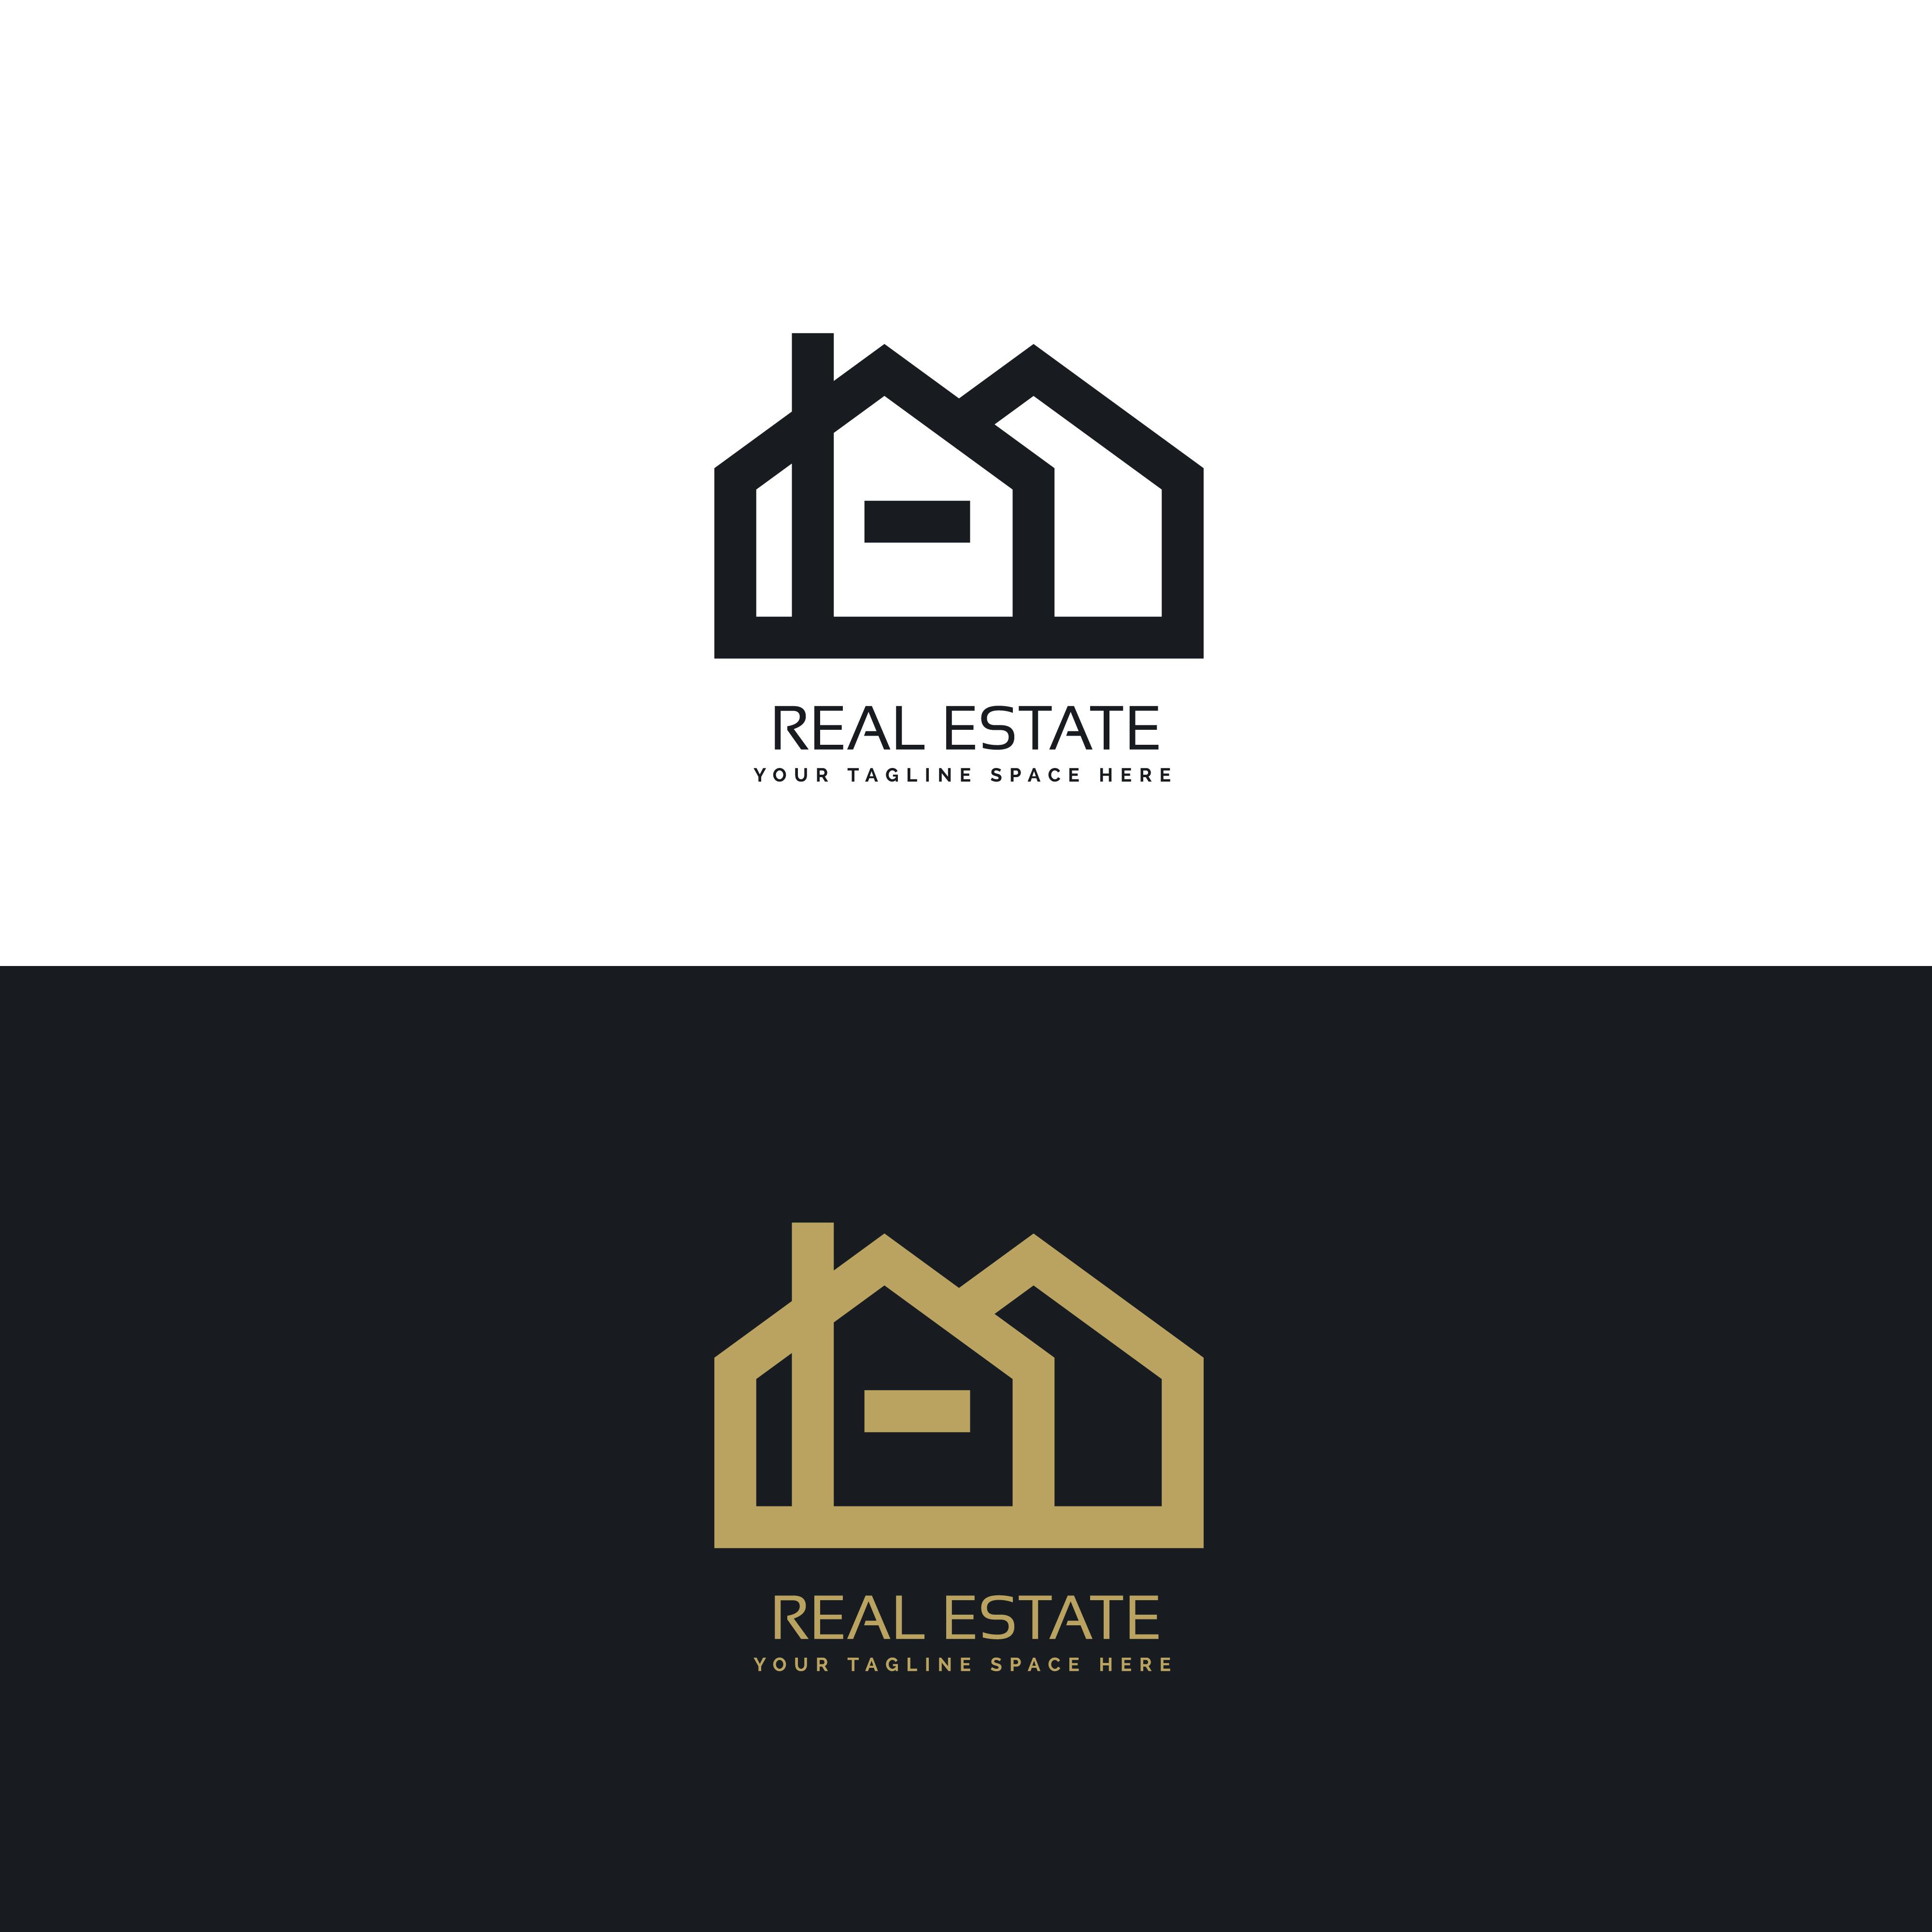 clean line style real estate logo design concept